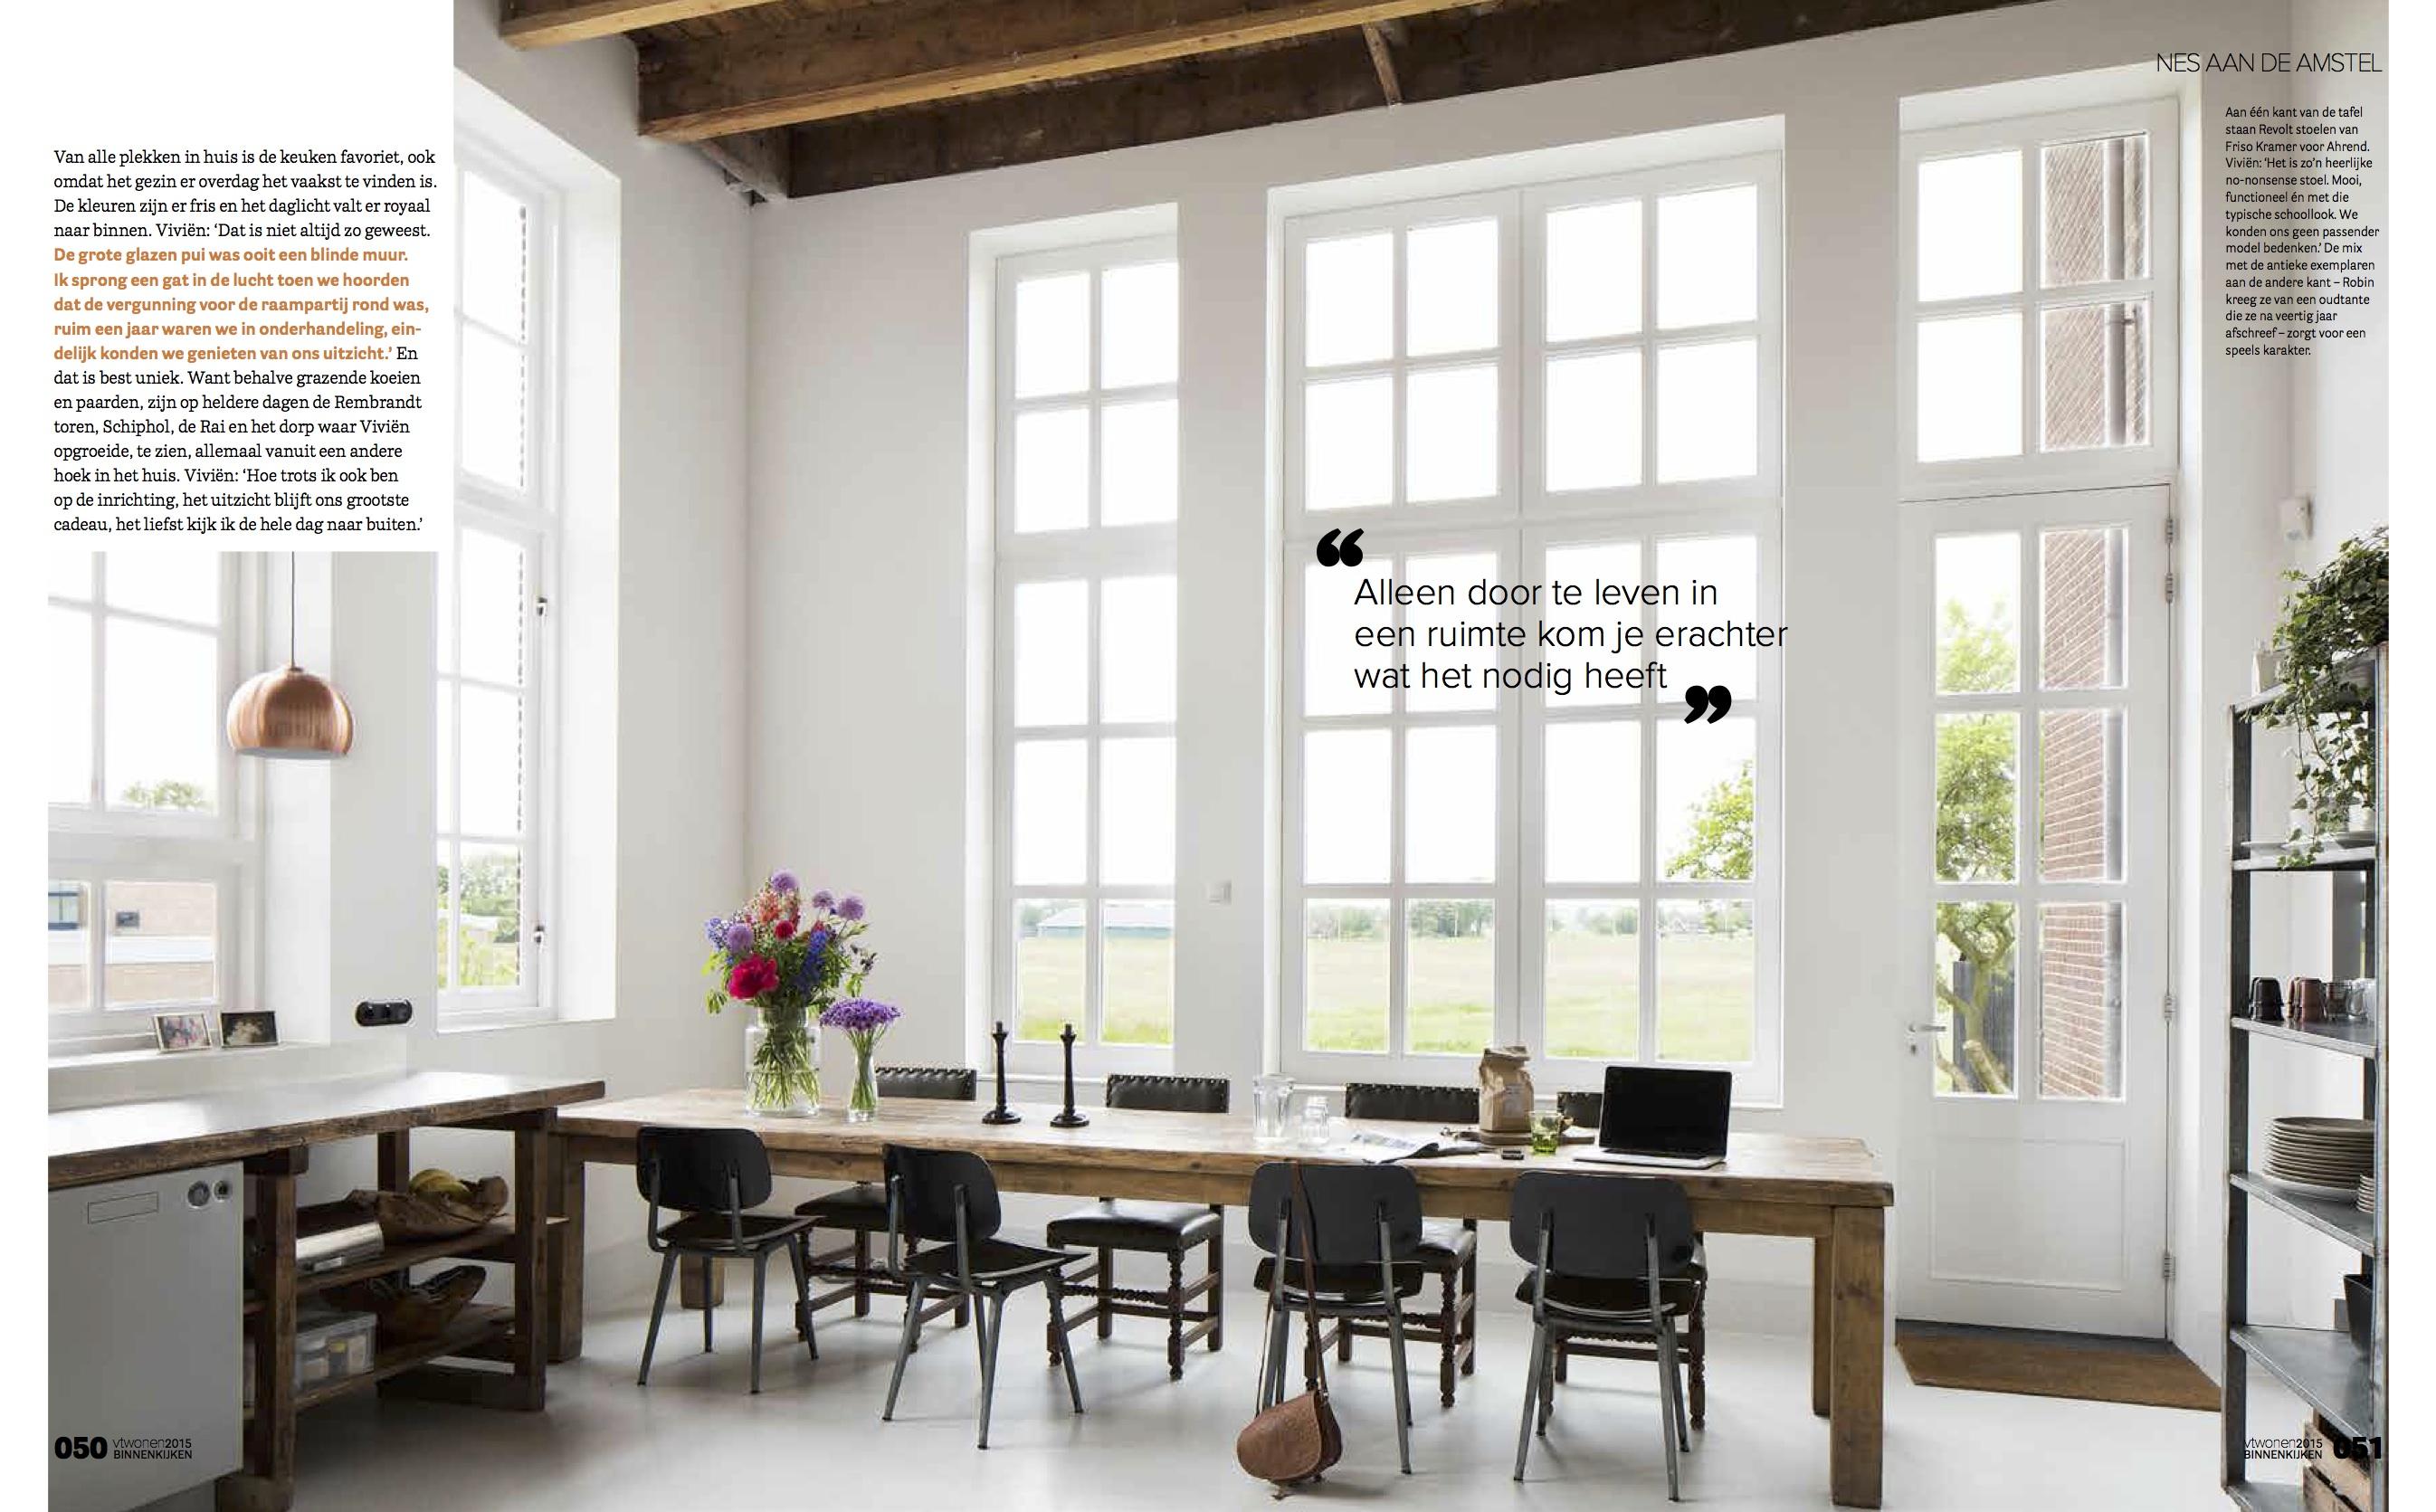 selinesteba.com - vtwonen-binnenkijkspecial-nes-ad-amstel2.jpg